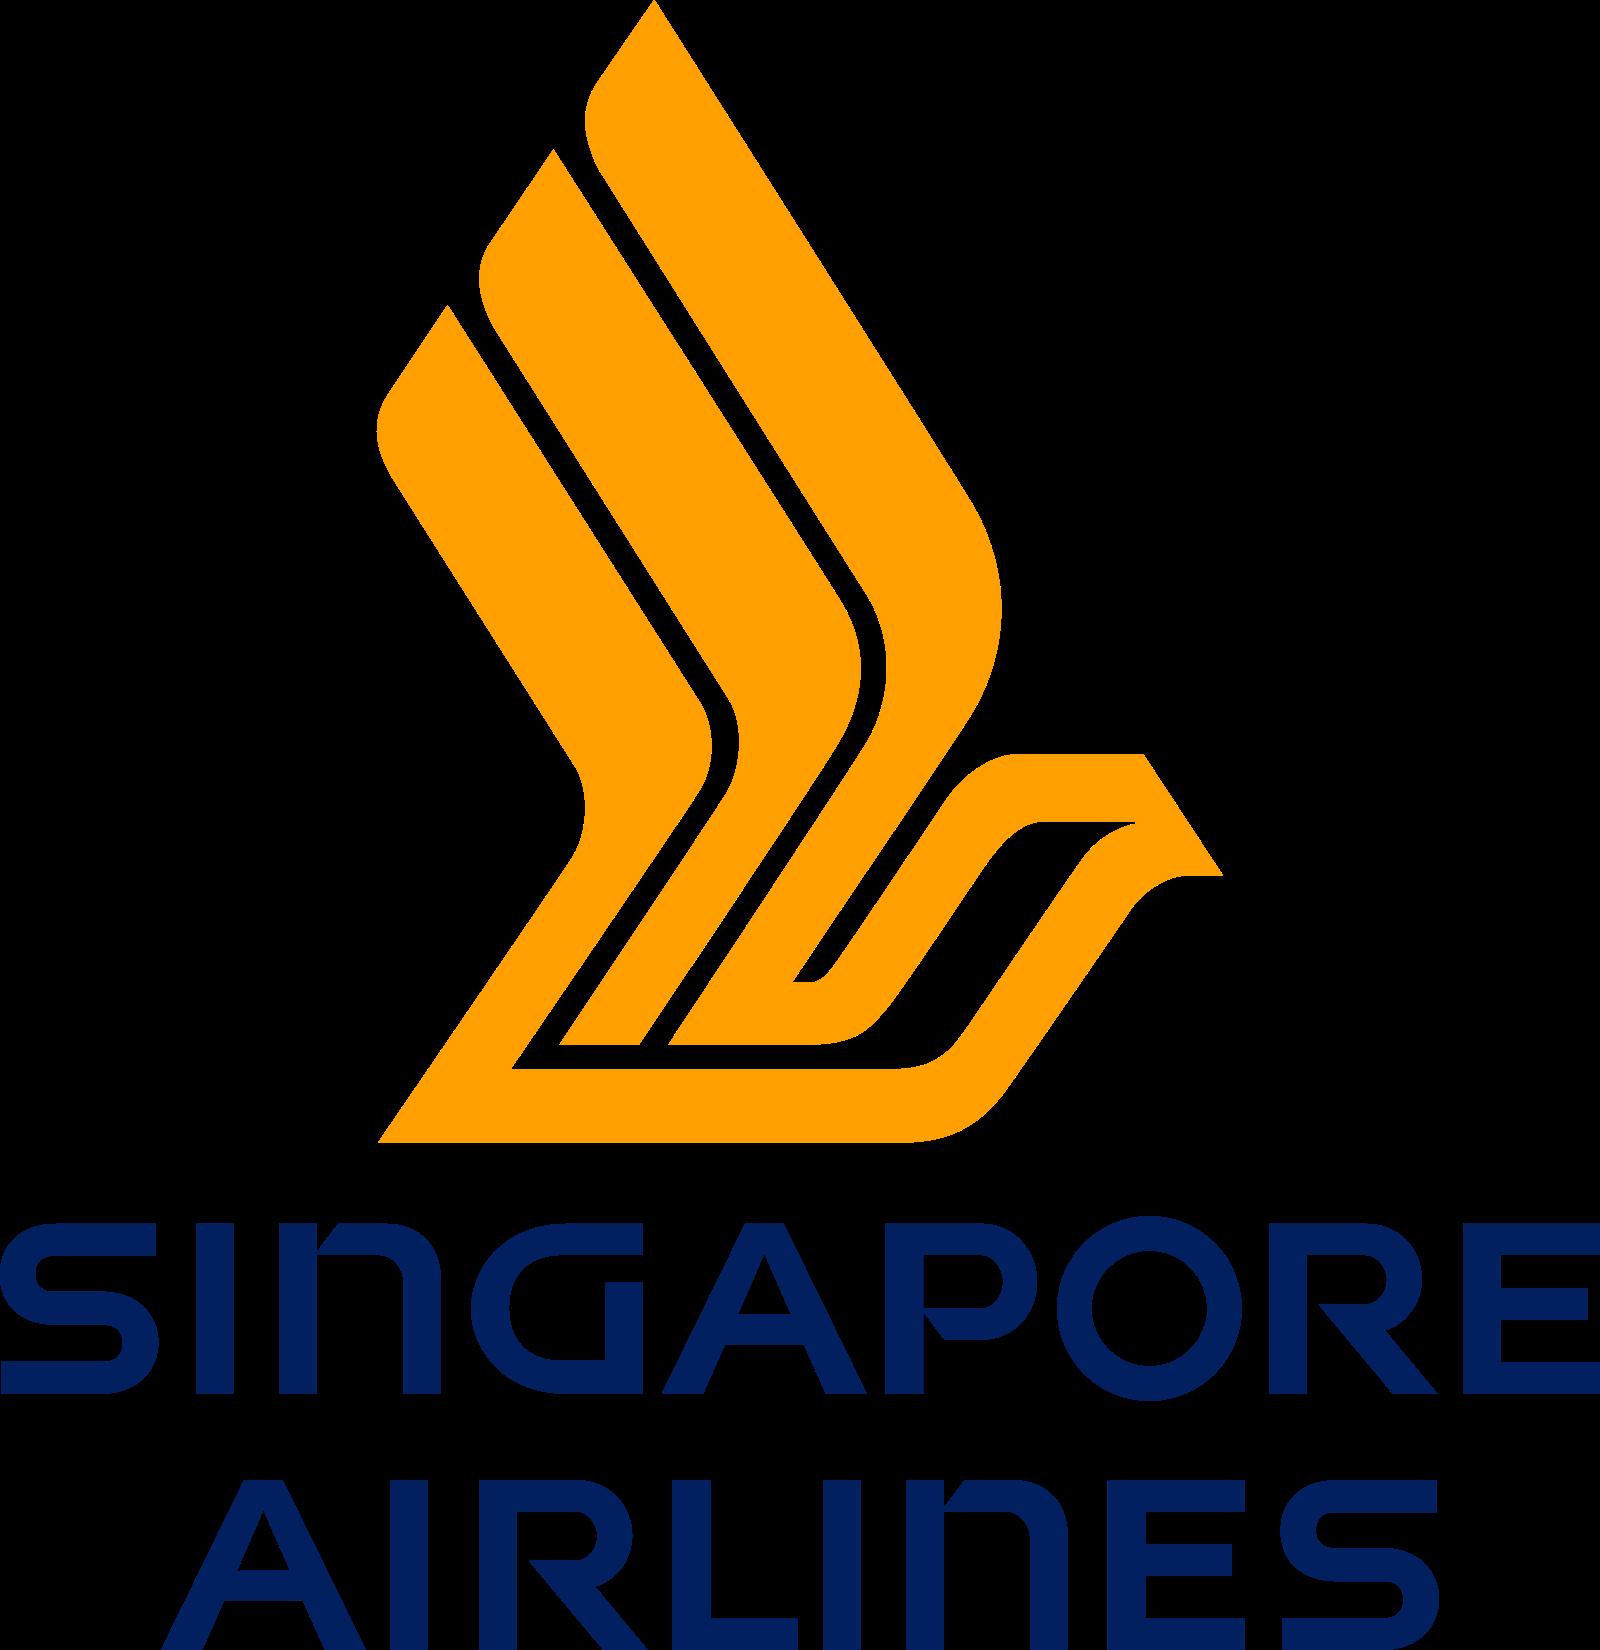 singapore airlines logo 5 - Singapore Airlines Logo